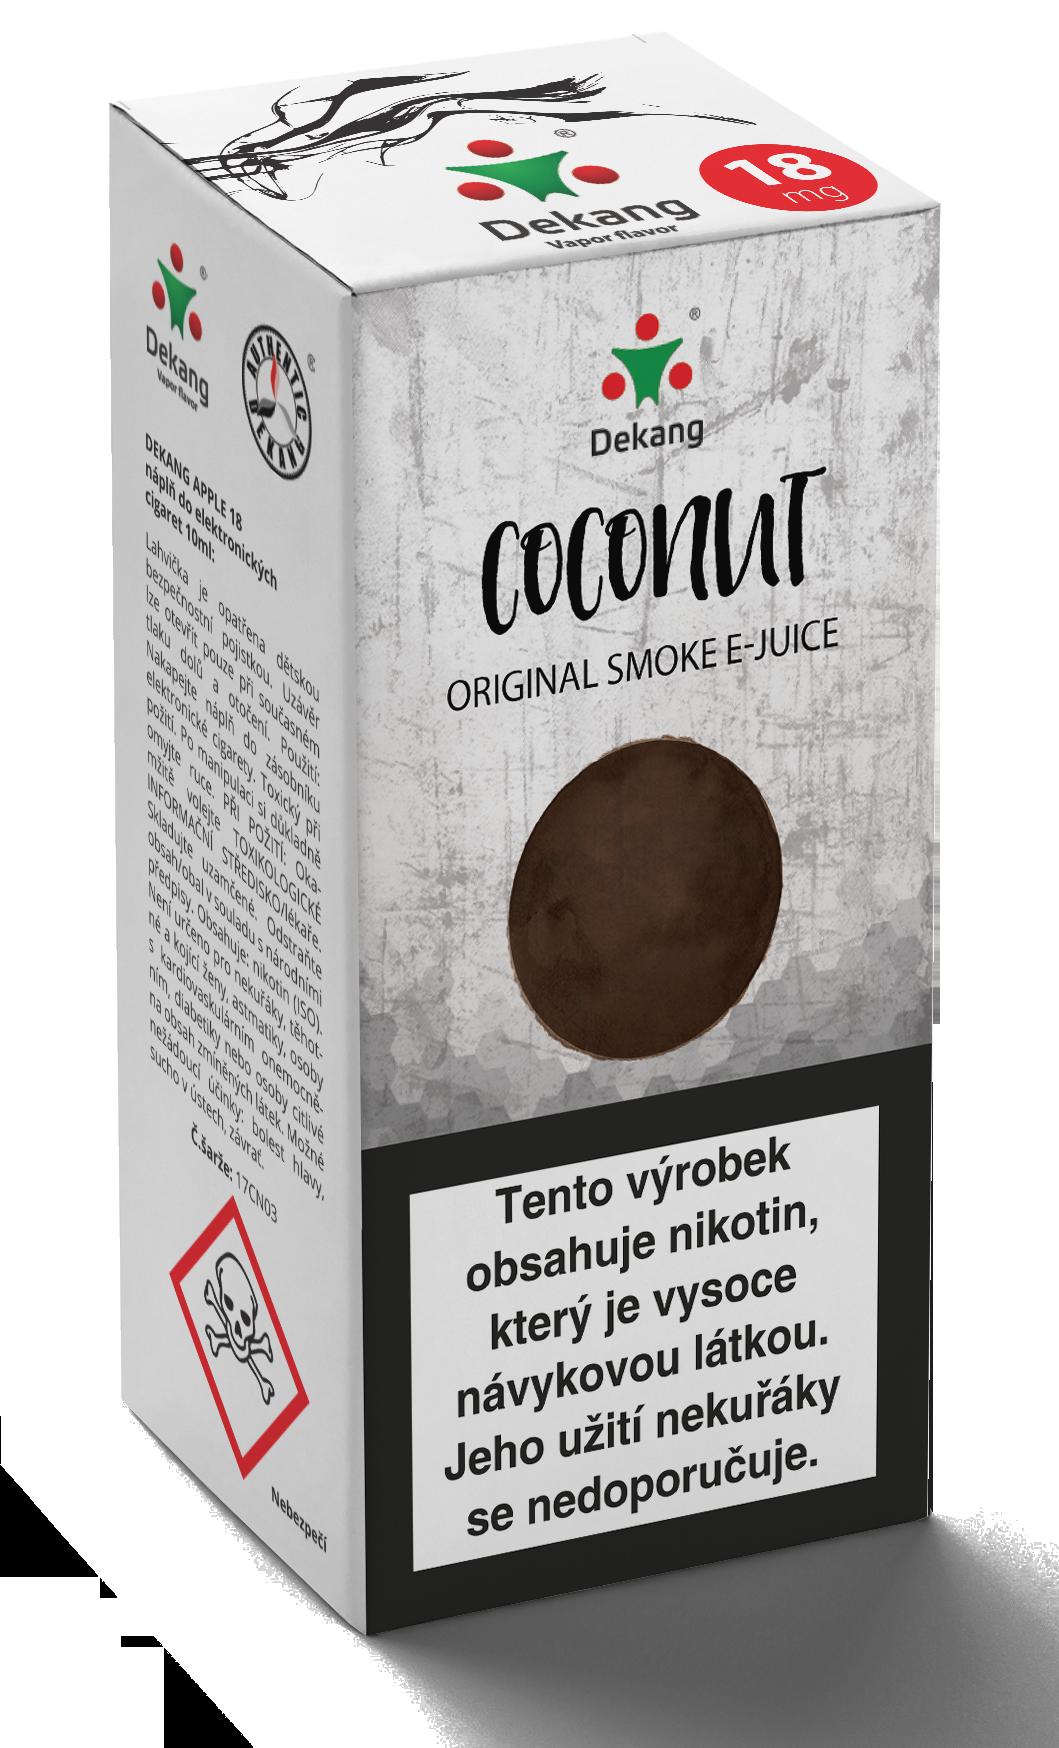 E-liquid Dekang 10ml Kokos -Coconut Množství nikotinu: 0mg